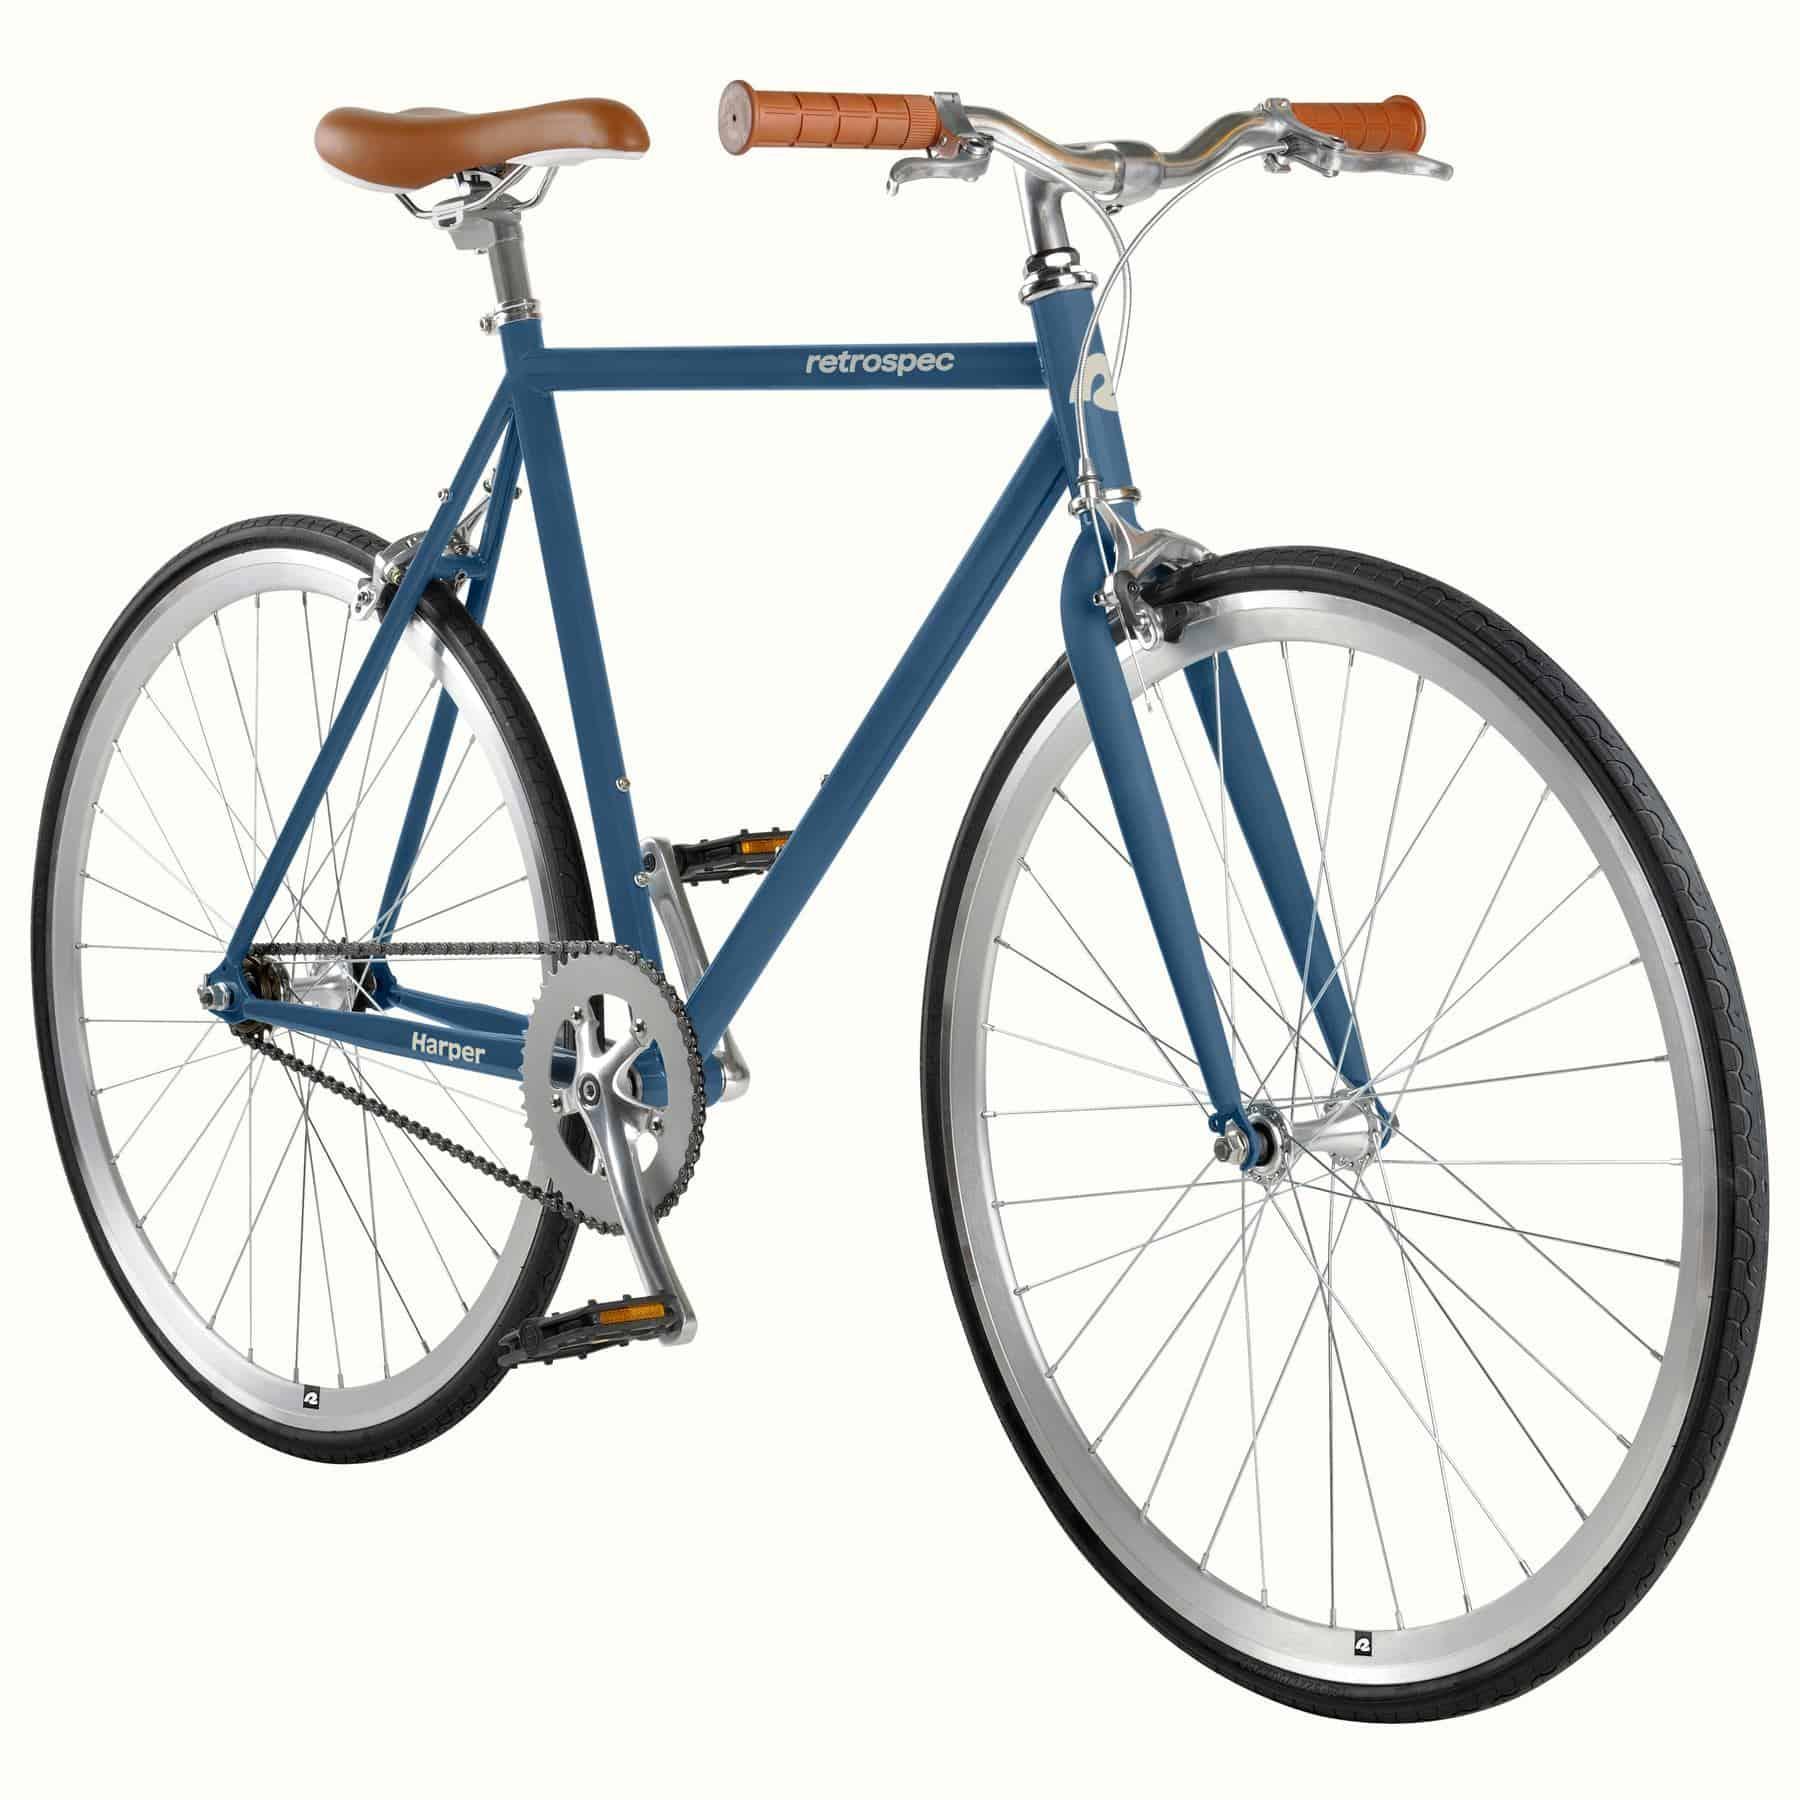 Retrospec Harper Fixie Bike / Single Speed – Navy